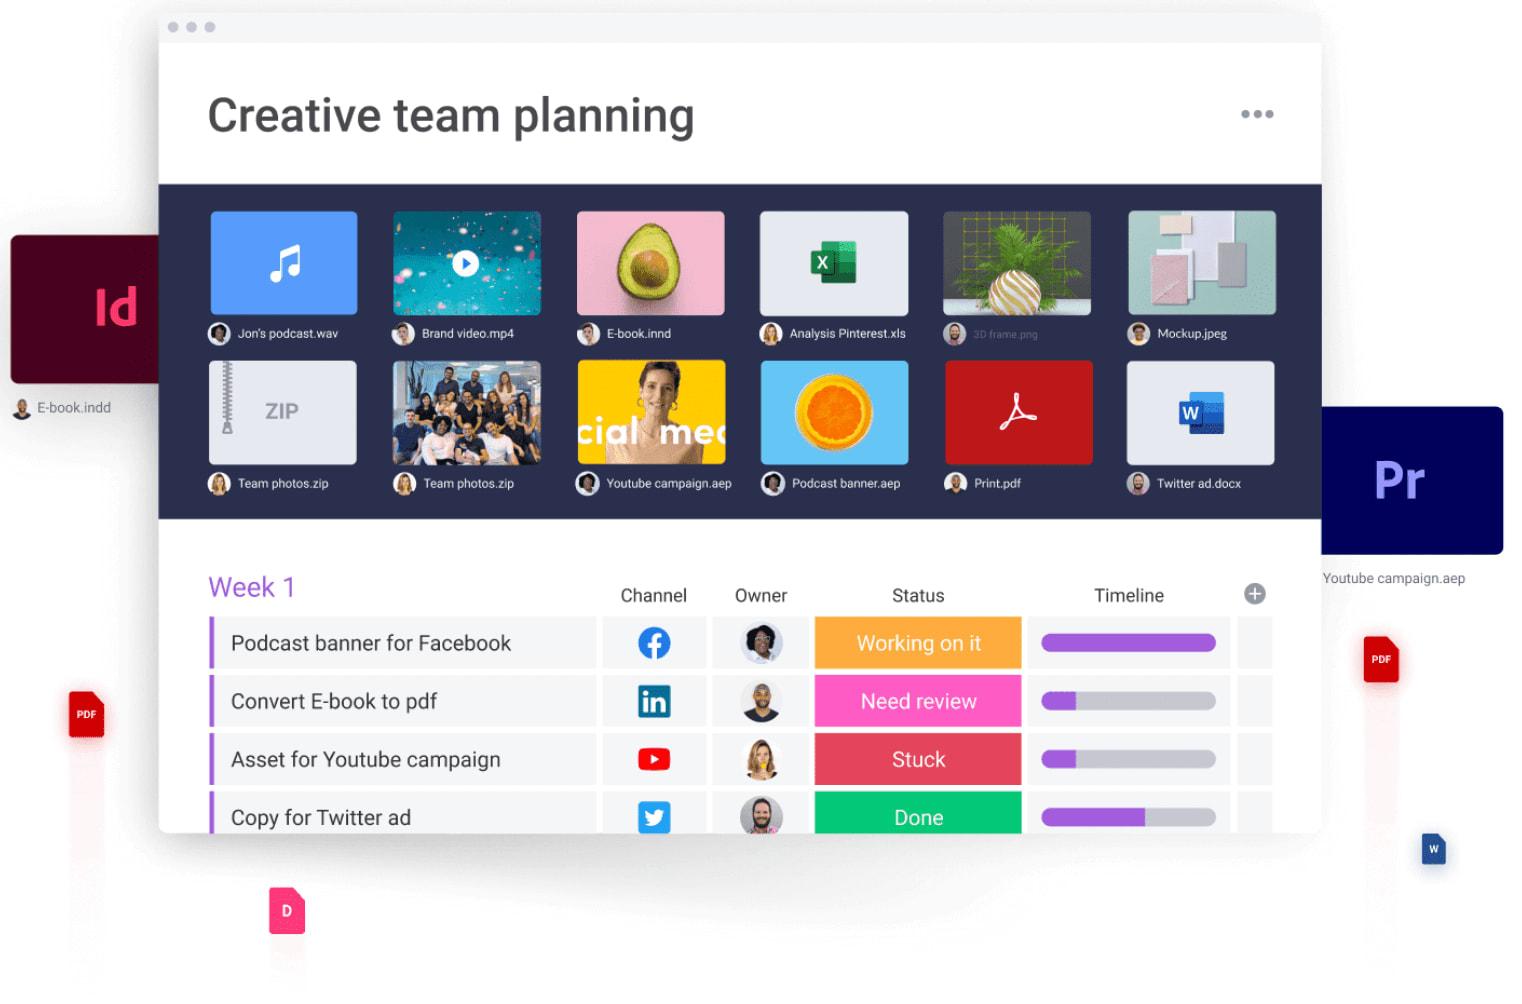 Screenshot of monday.com creative team planning views.